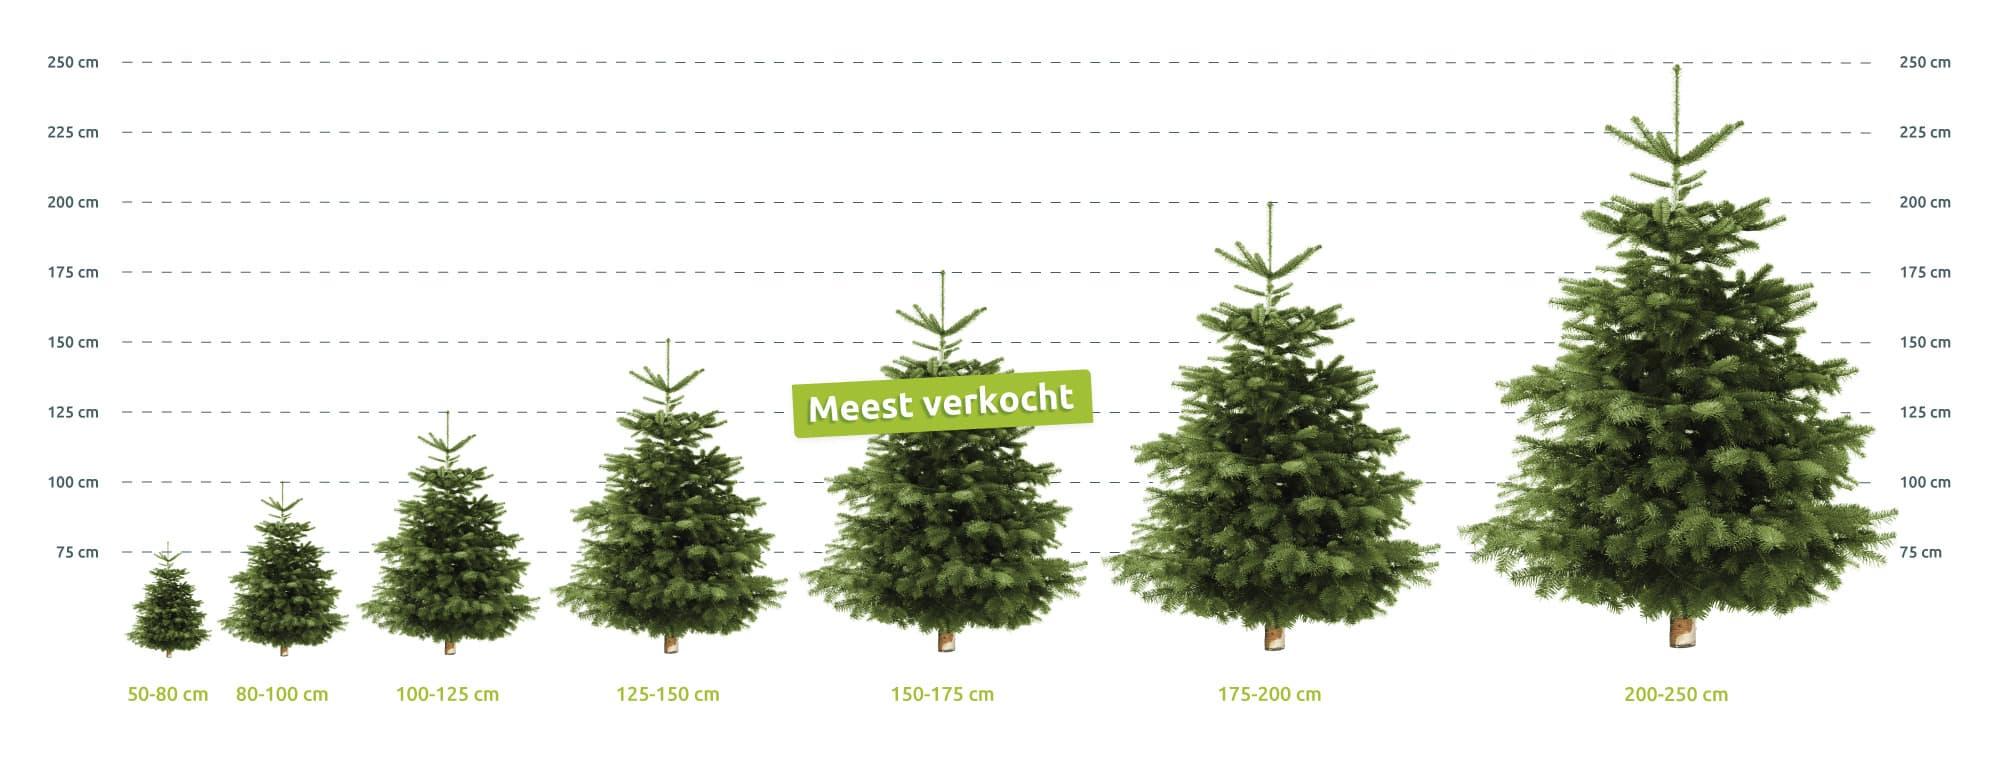 echte levende Nordmann Kerstbomen formaten afmetingen Hermie online webshop